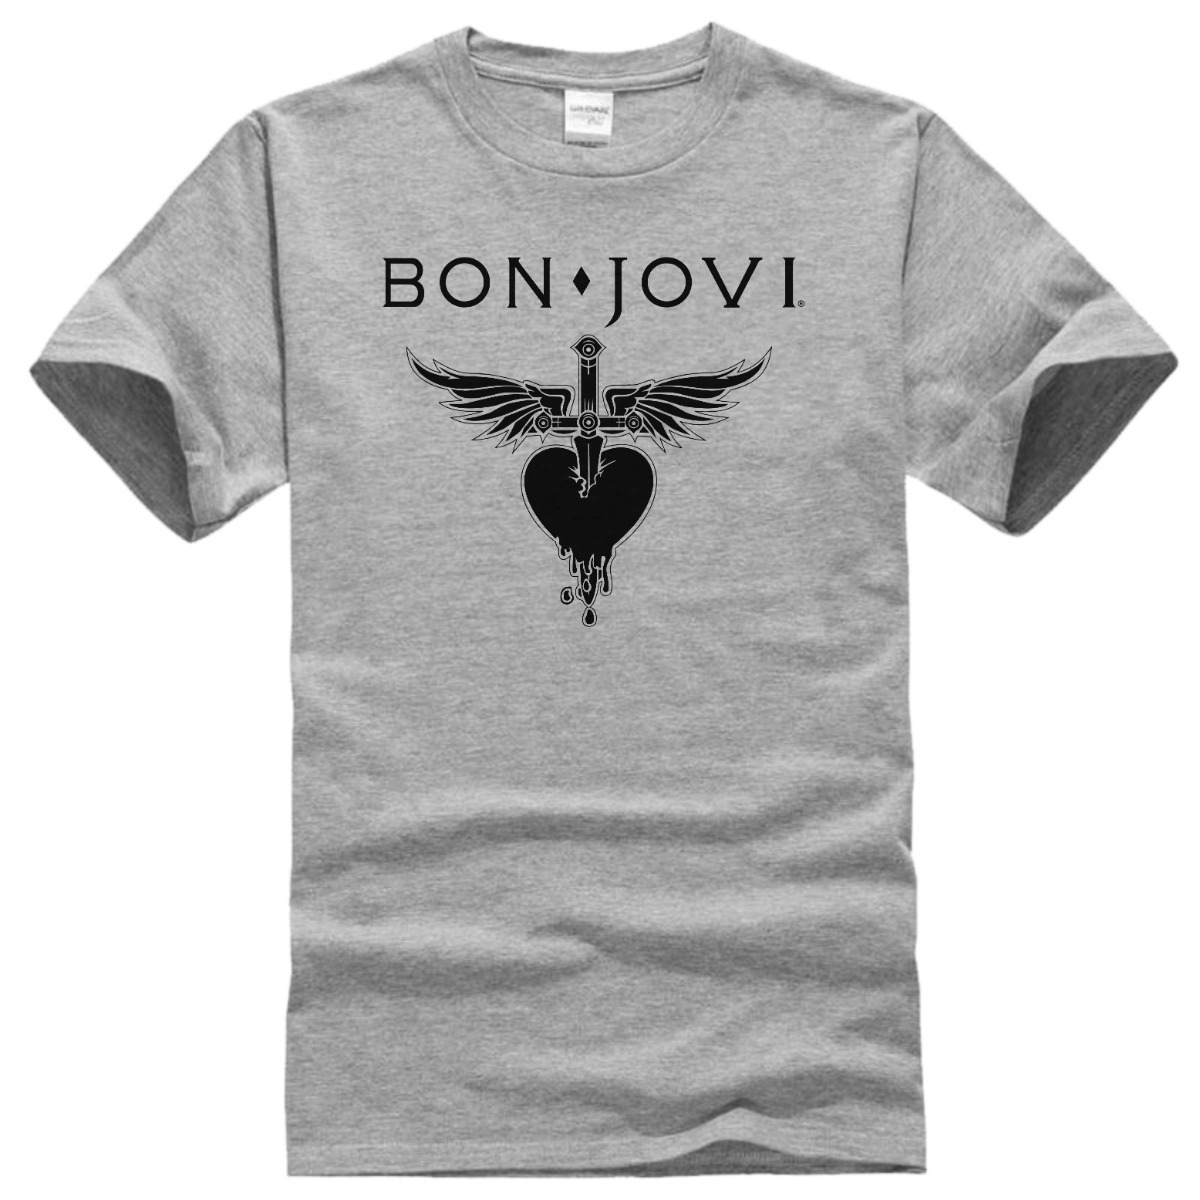 3d10d0bfc camiseta bon jovi camisa masculina banda rock frete grátis. Carregando zoom.